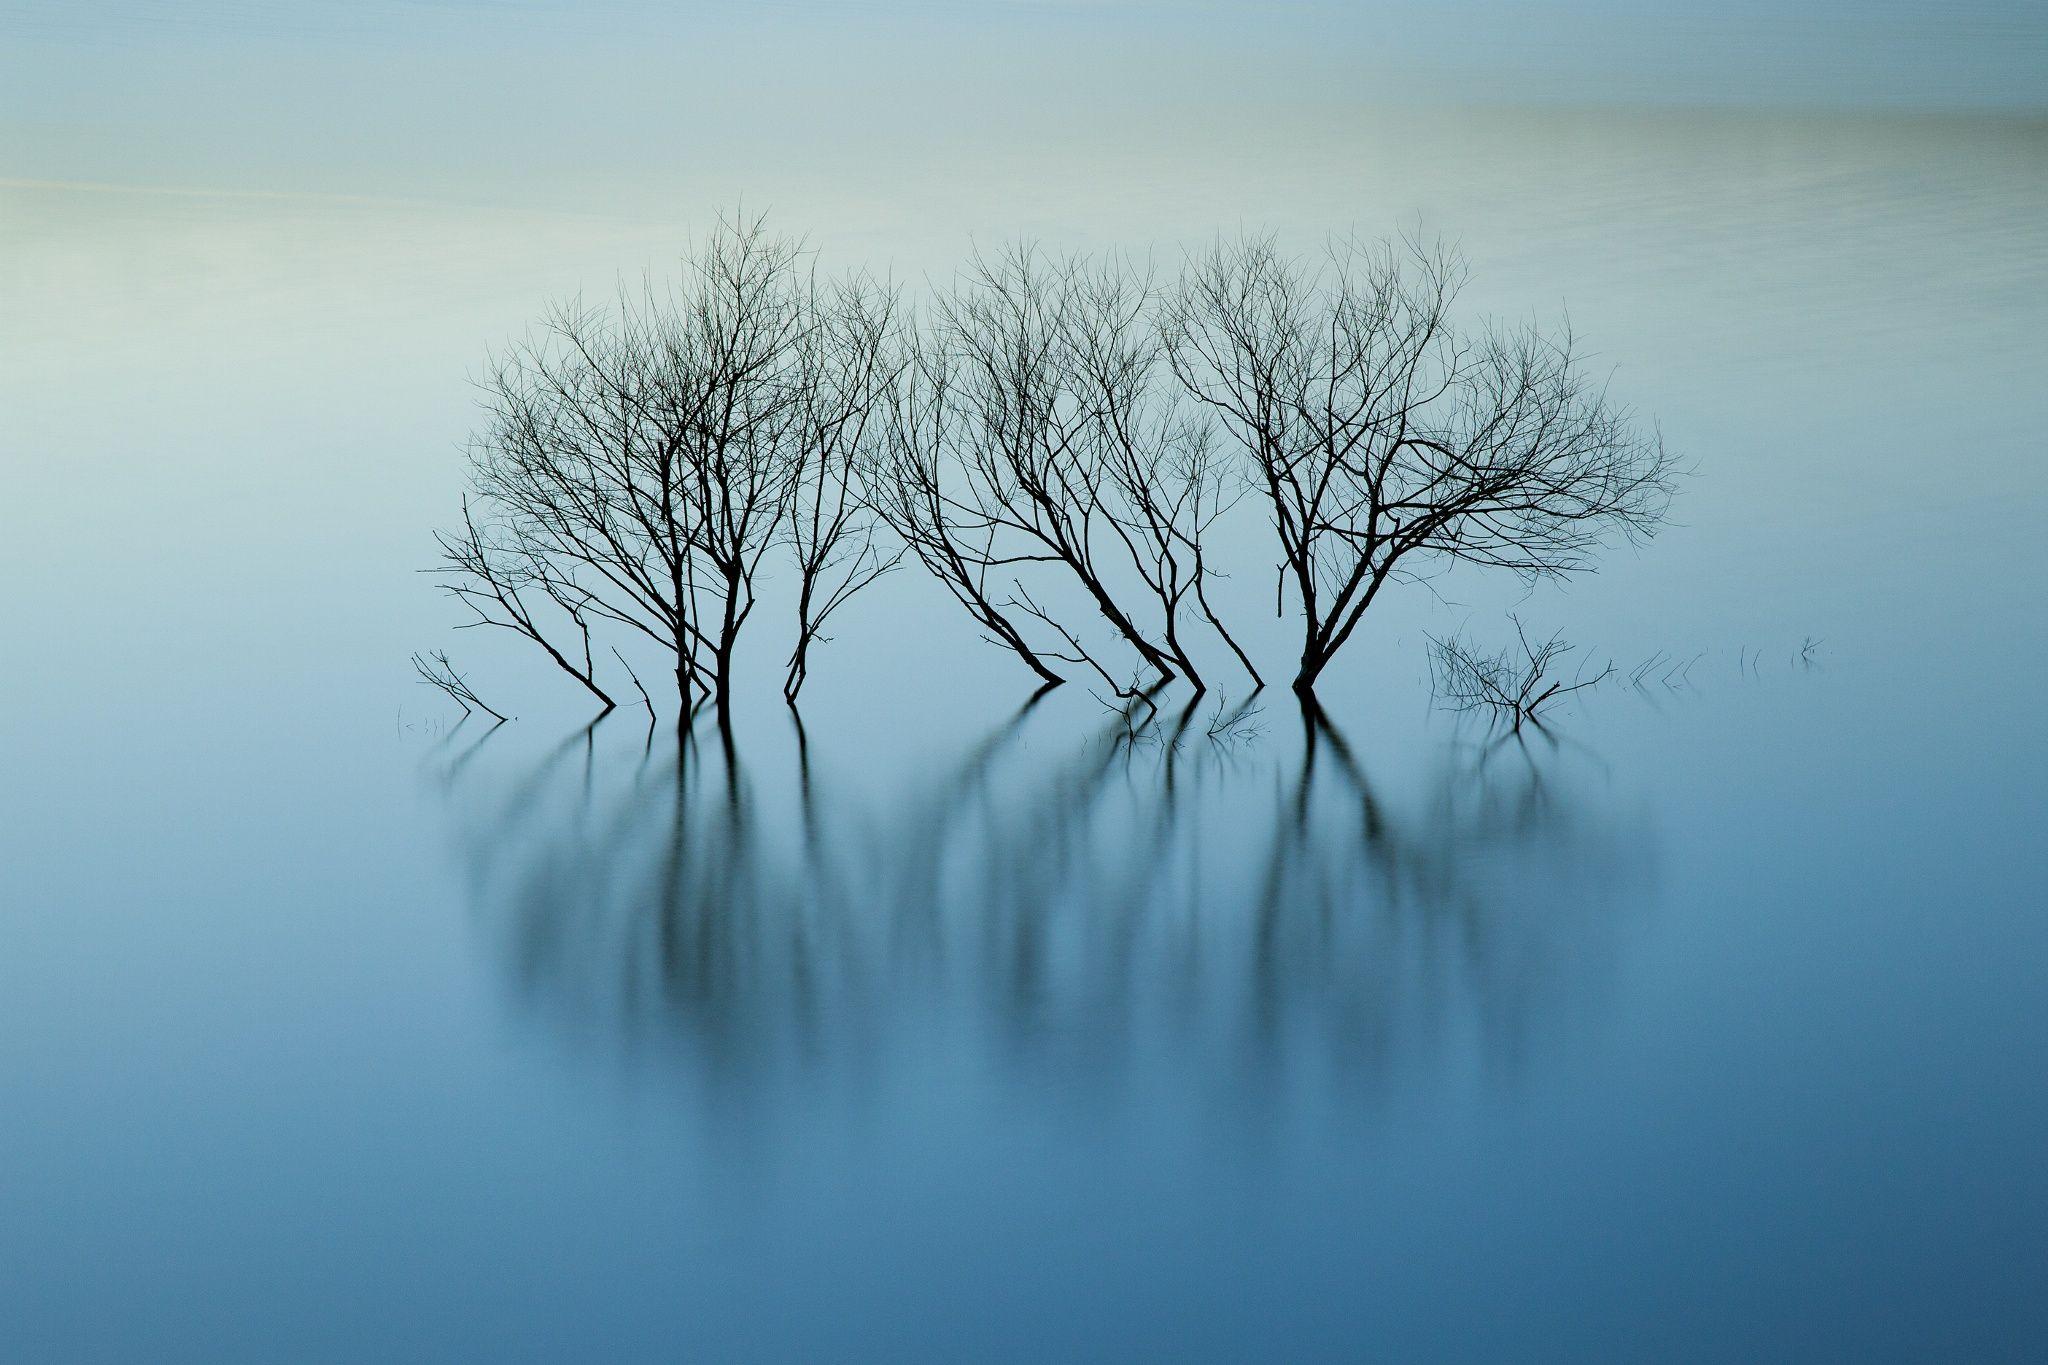 Photograph I Hear the Water Dreaming by Katsuhiko Honda on 500px